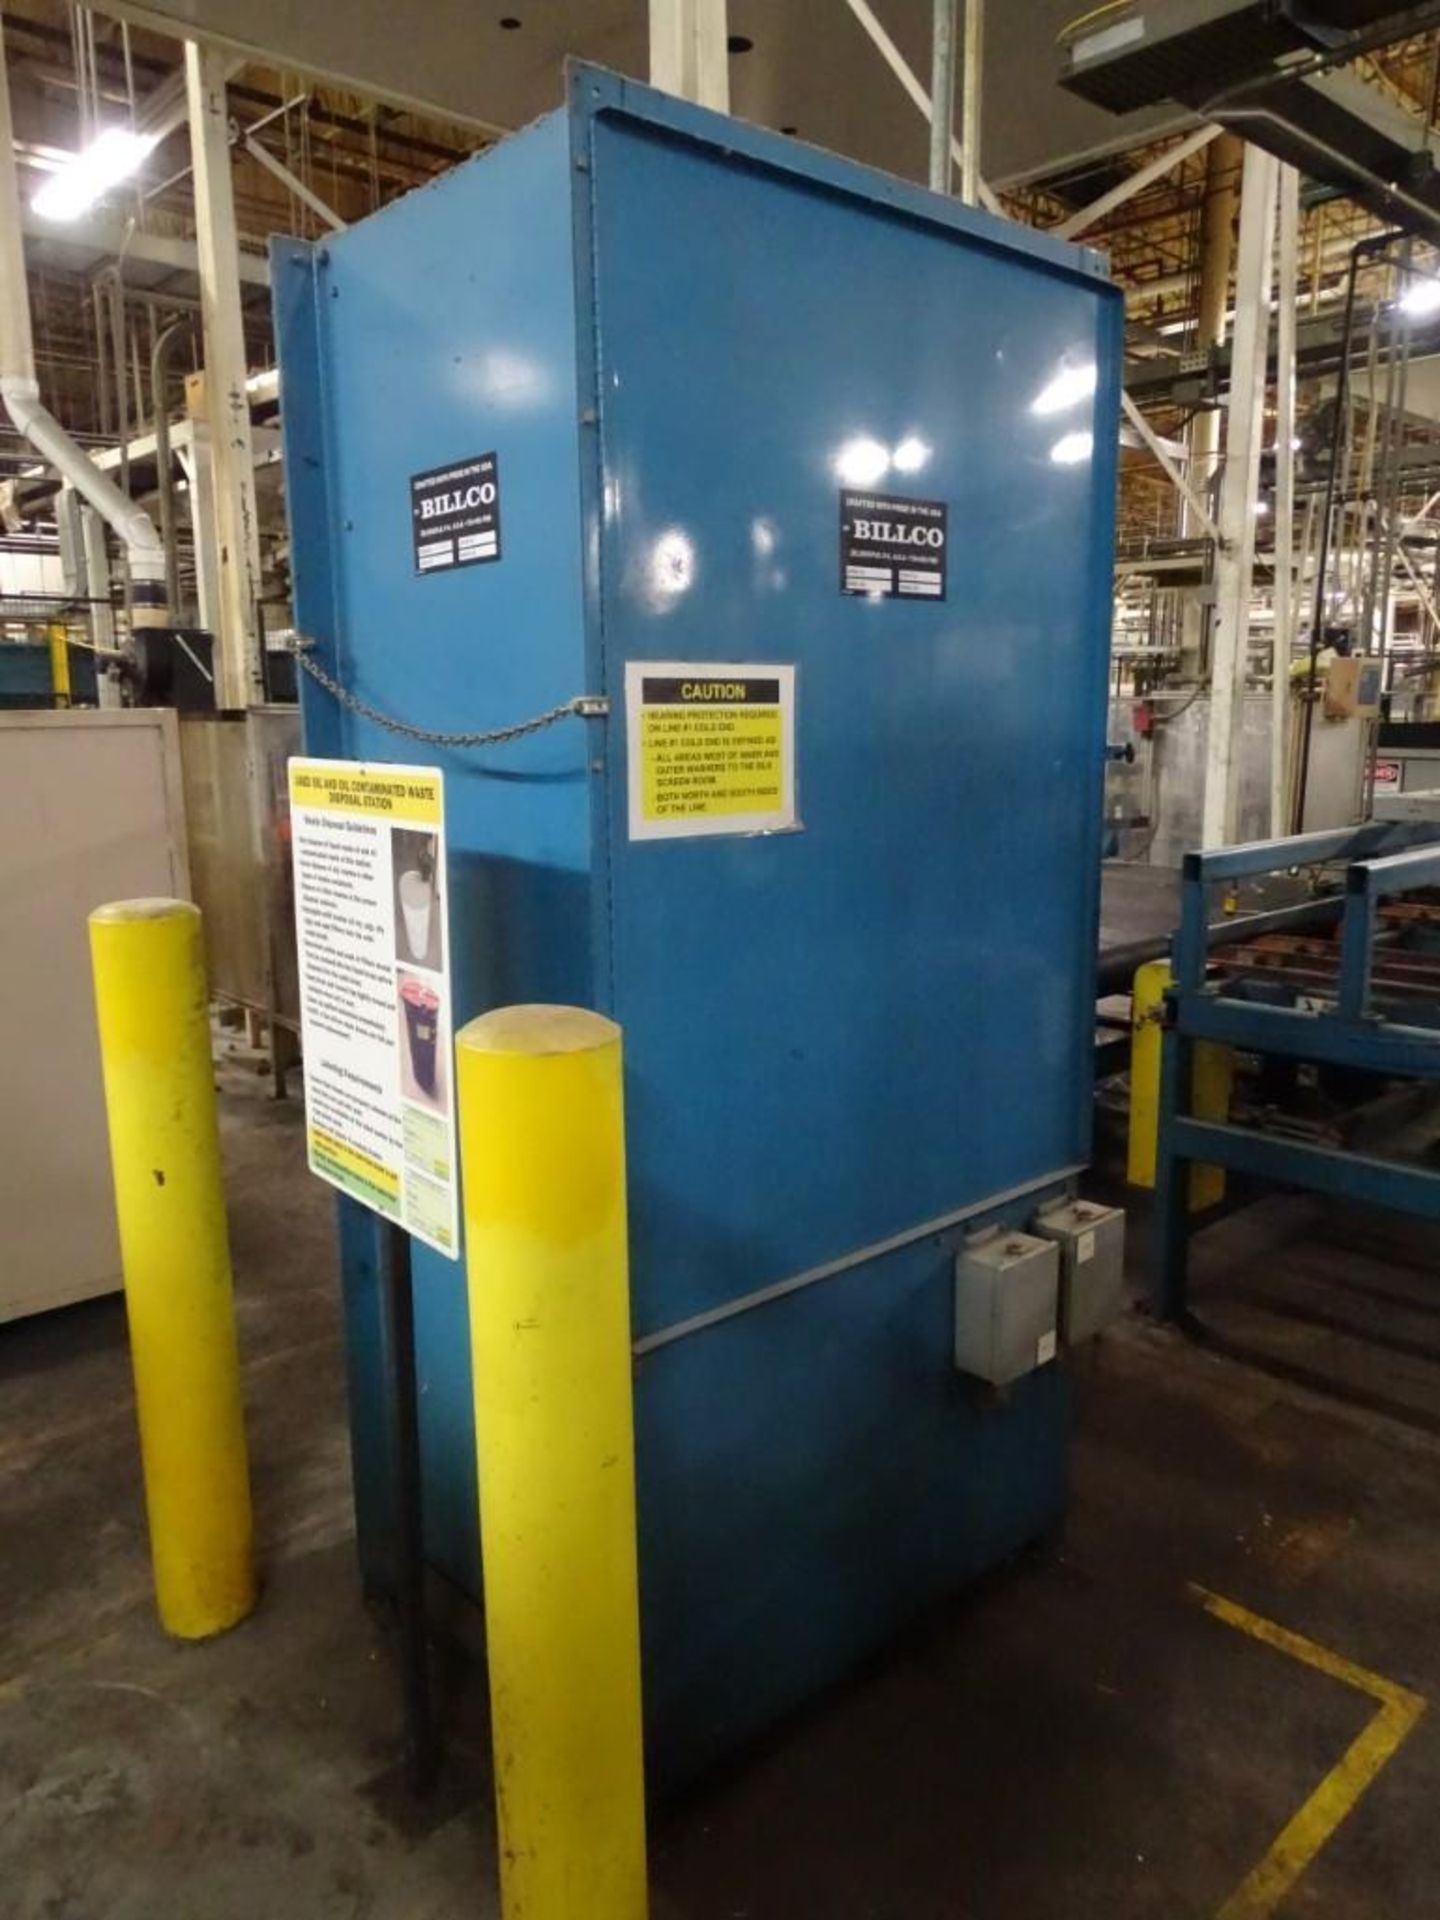 Billco Glass Cutting Conveyor System - Image 6 of 11